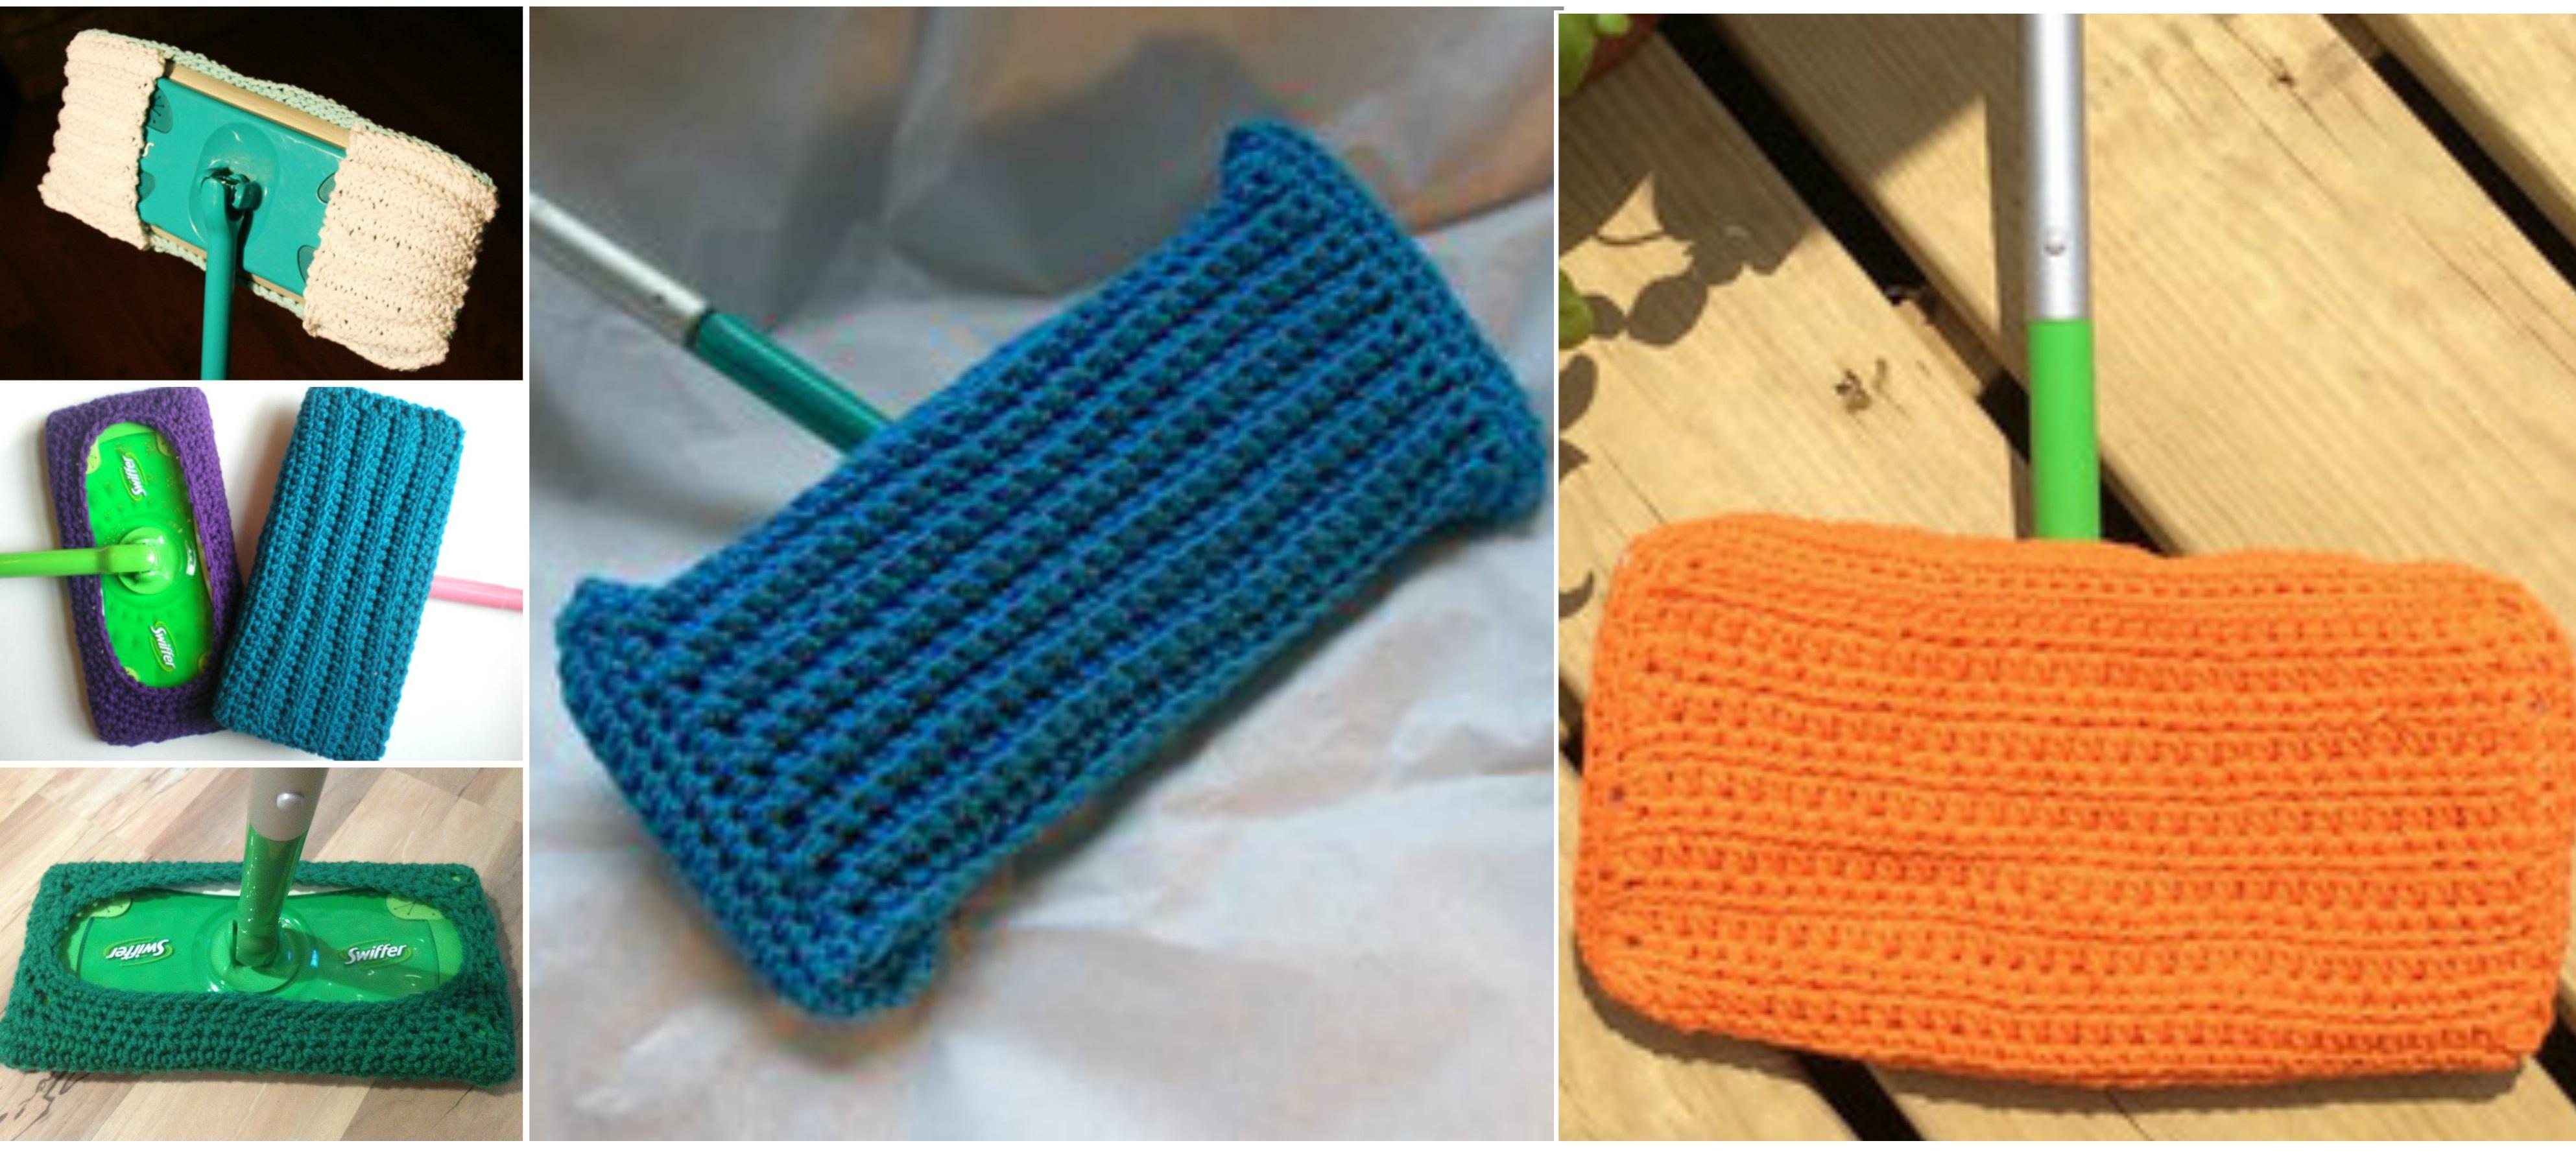 Crochet Reusable Swiffer Pad